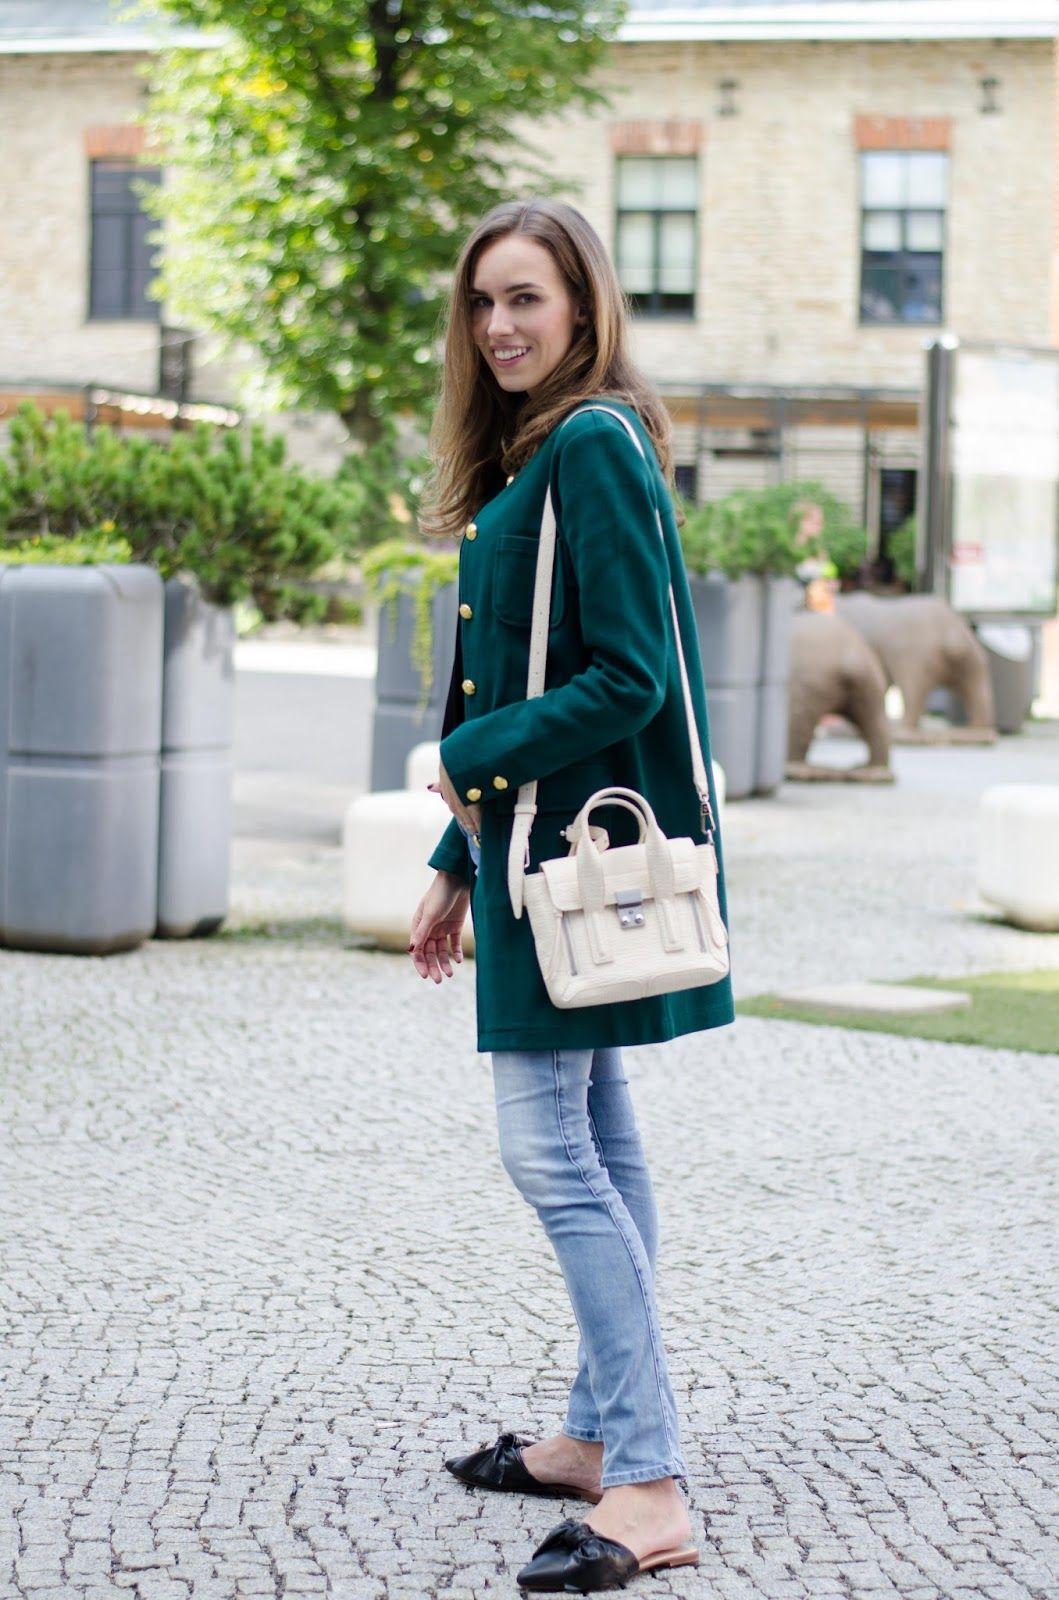 loopschoenen maat 7 Koop Authentiek 3.1 phillip lim mini pashli bag outfit in 2019   Phillip lim ...